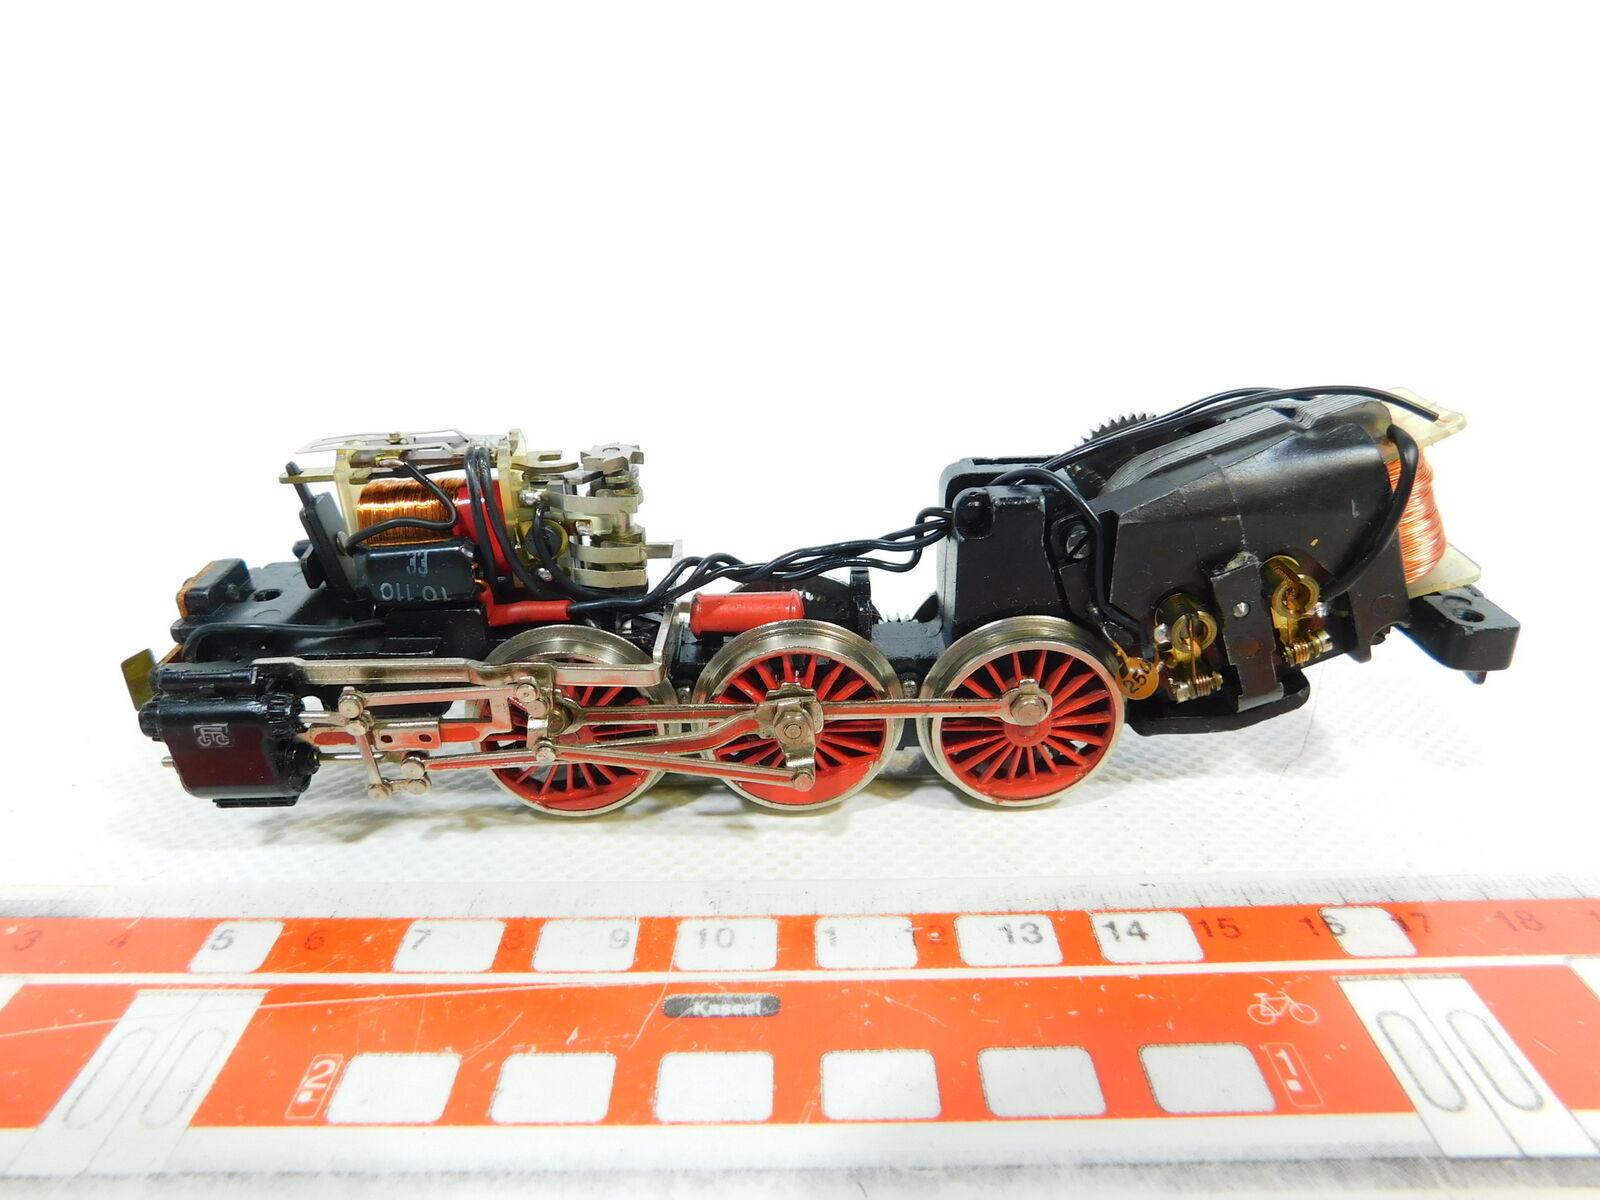 Bv721-0, 5 Märklin h0 00 AC chassis with Telex for 3026 Steam Locomotive,